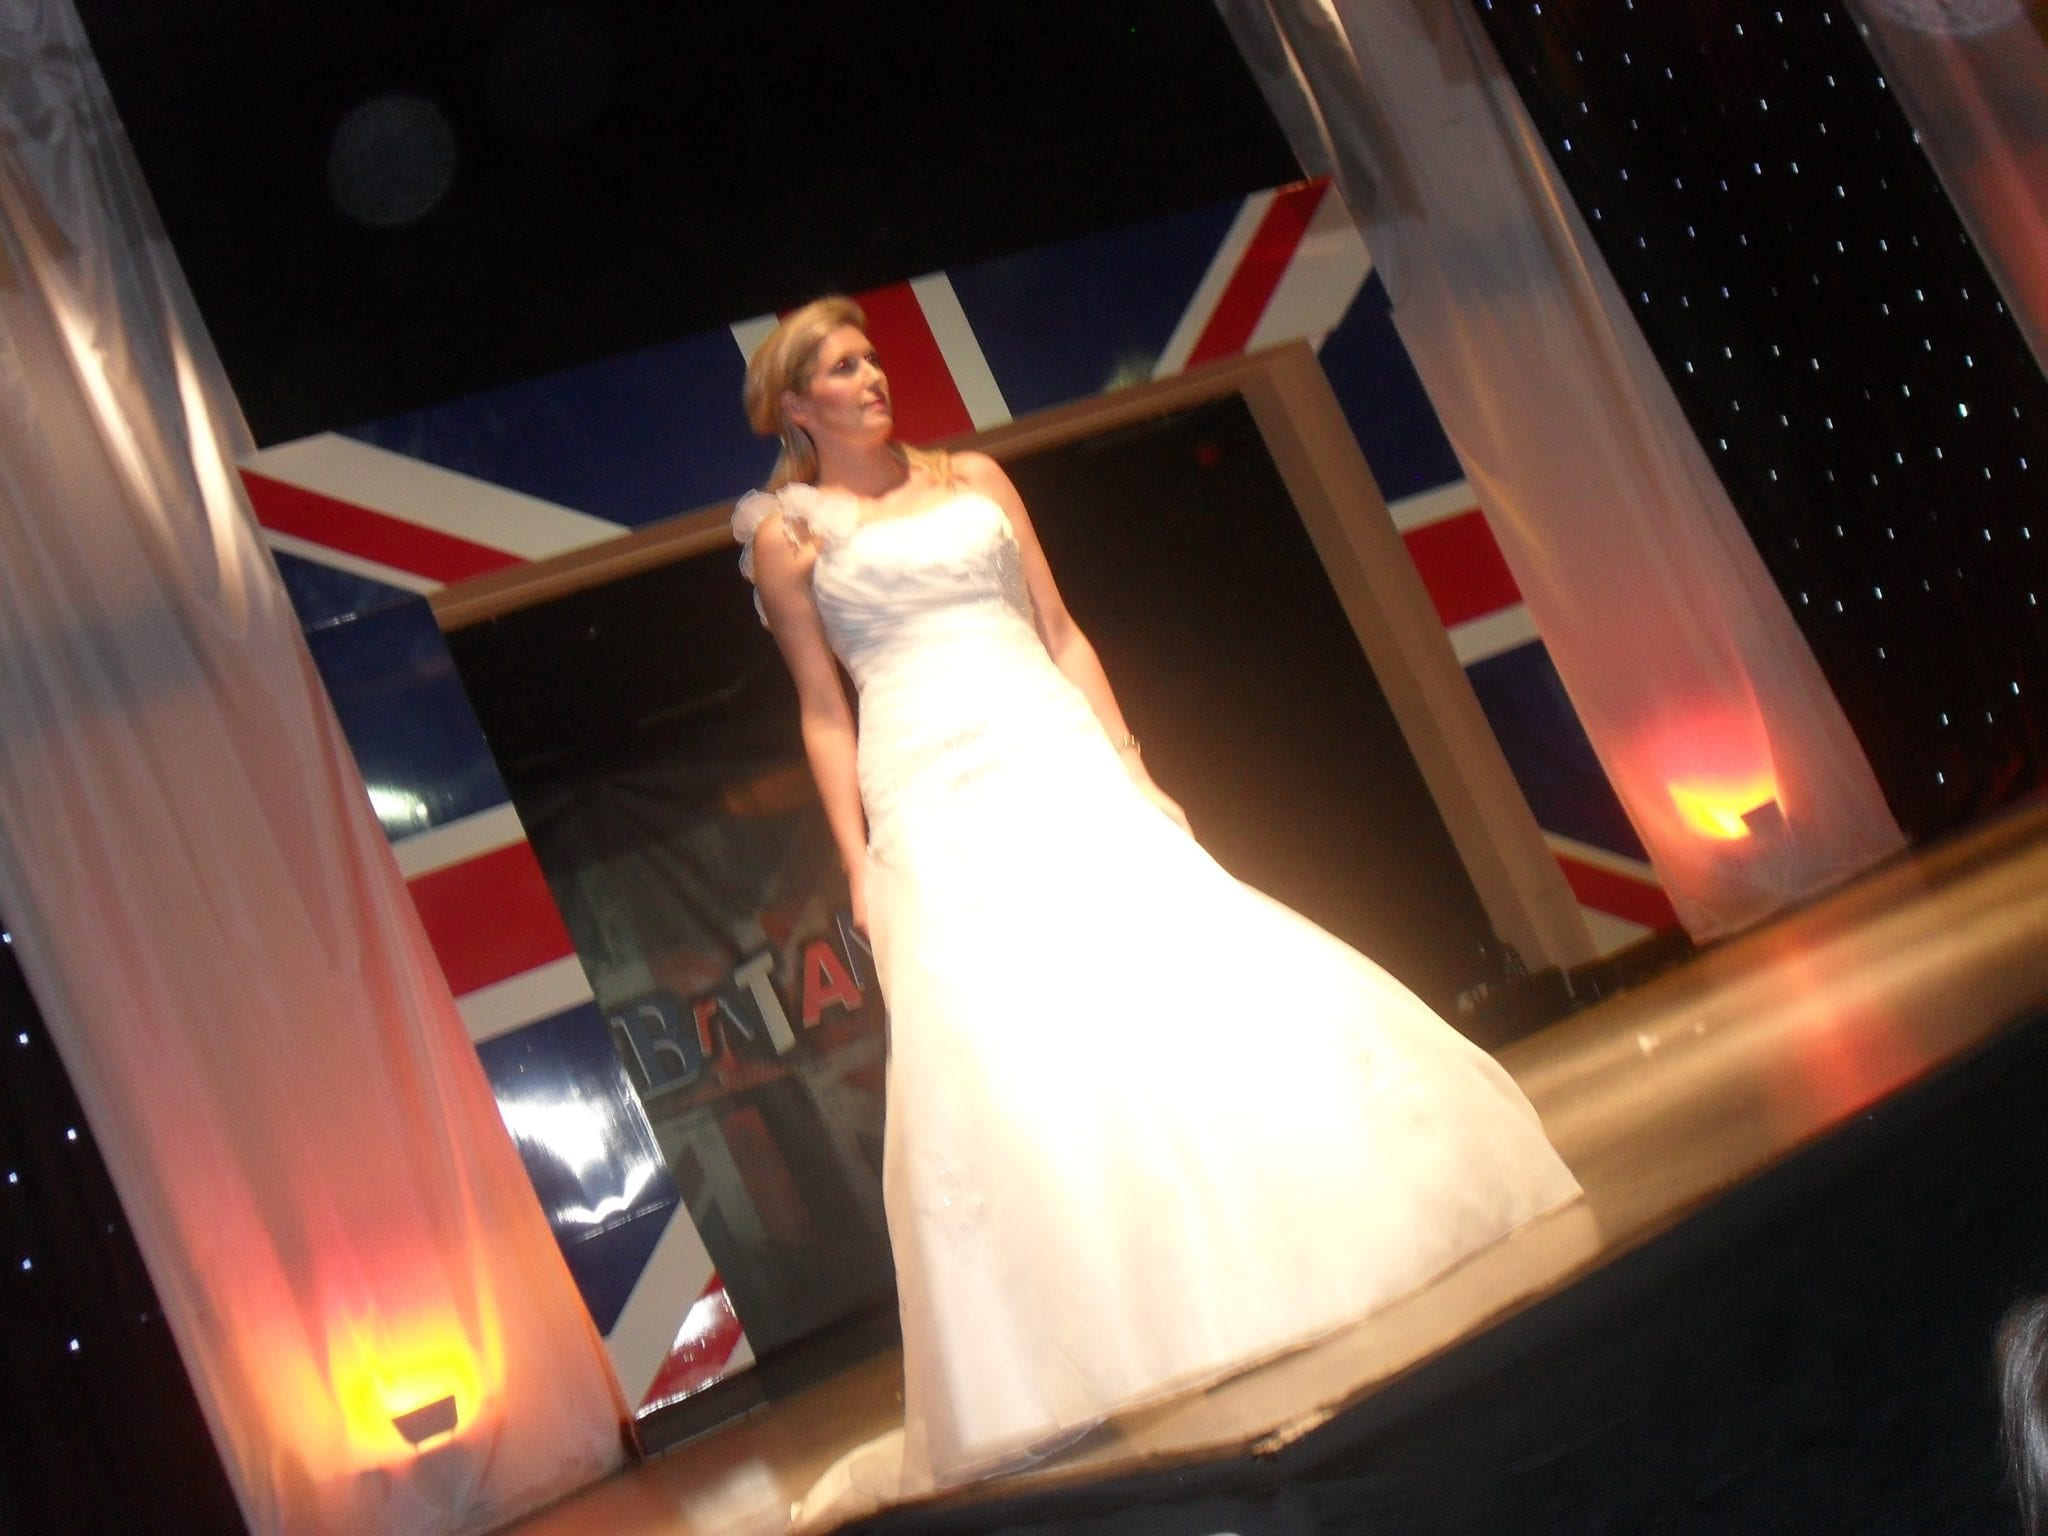 Bridal Gathering at Rainton Meadows Round-Up